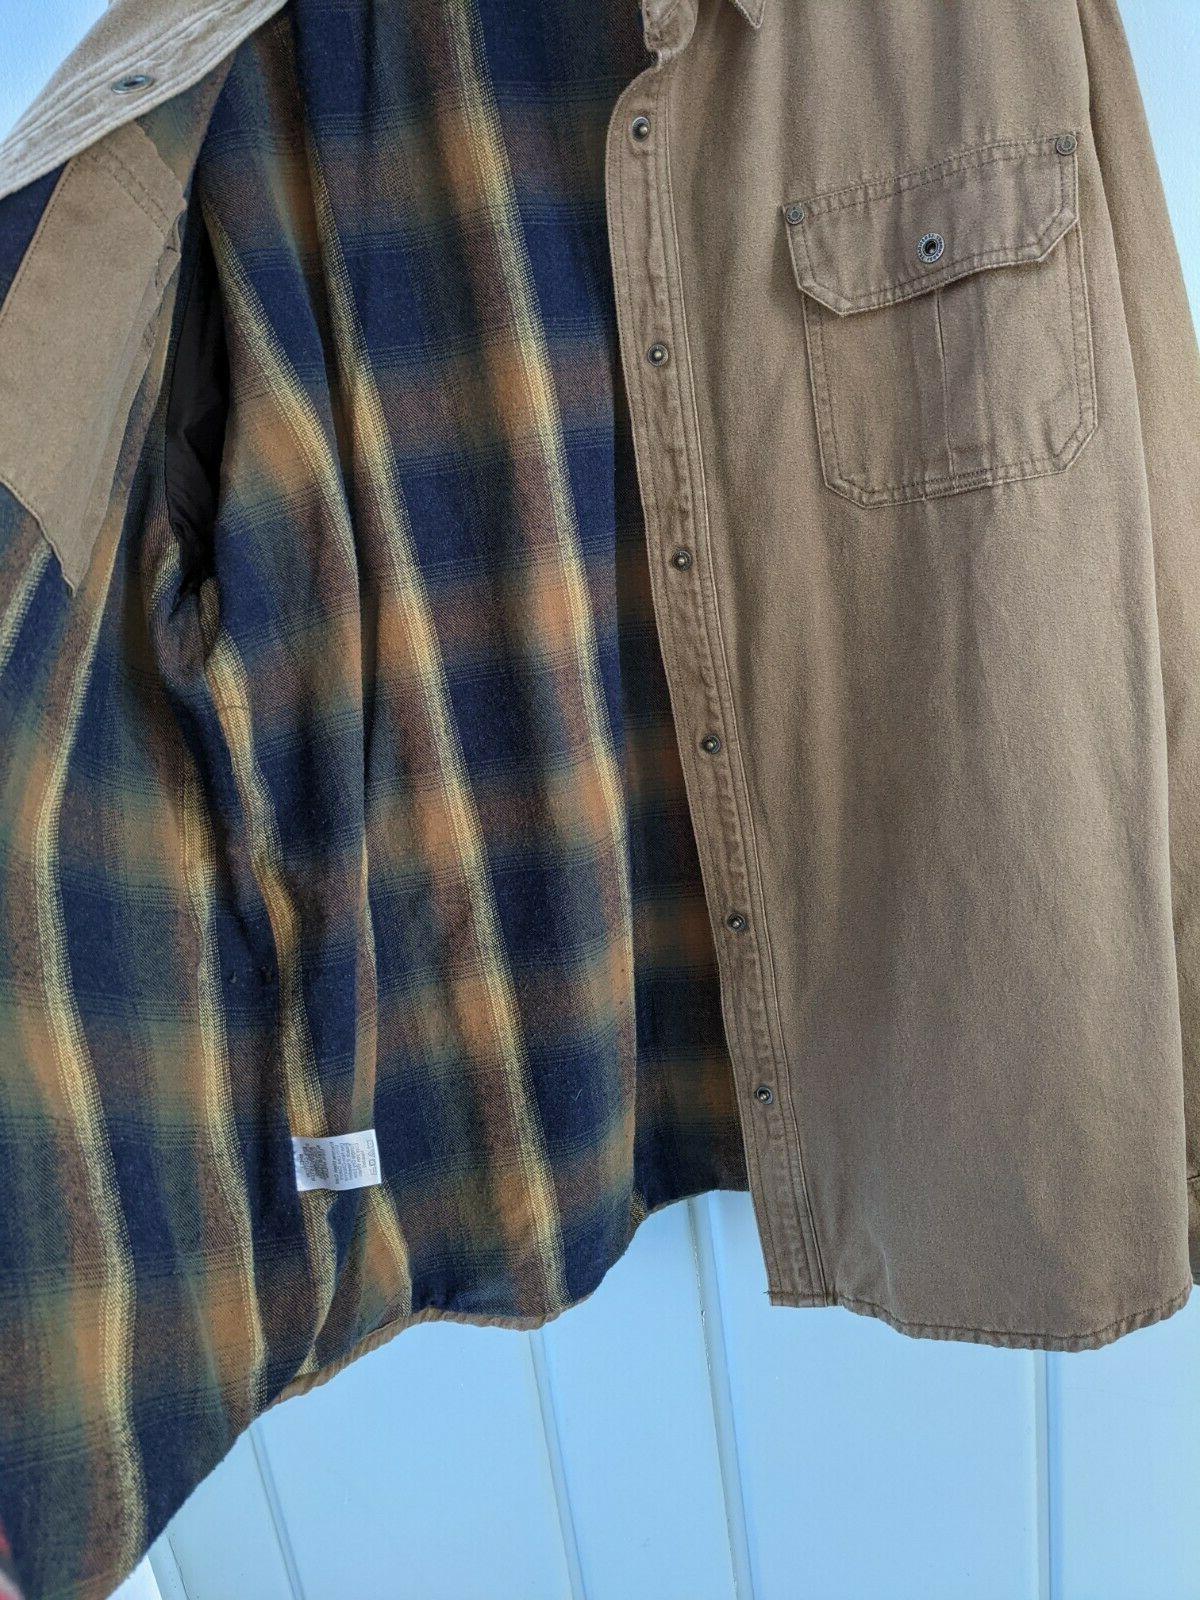 Legendary Journeyman Jacket Jac Flannel Lined Rugged